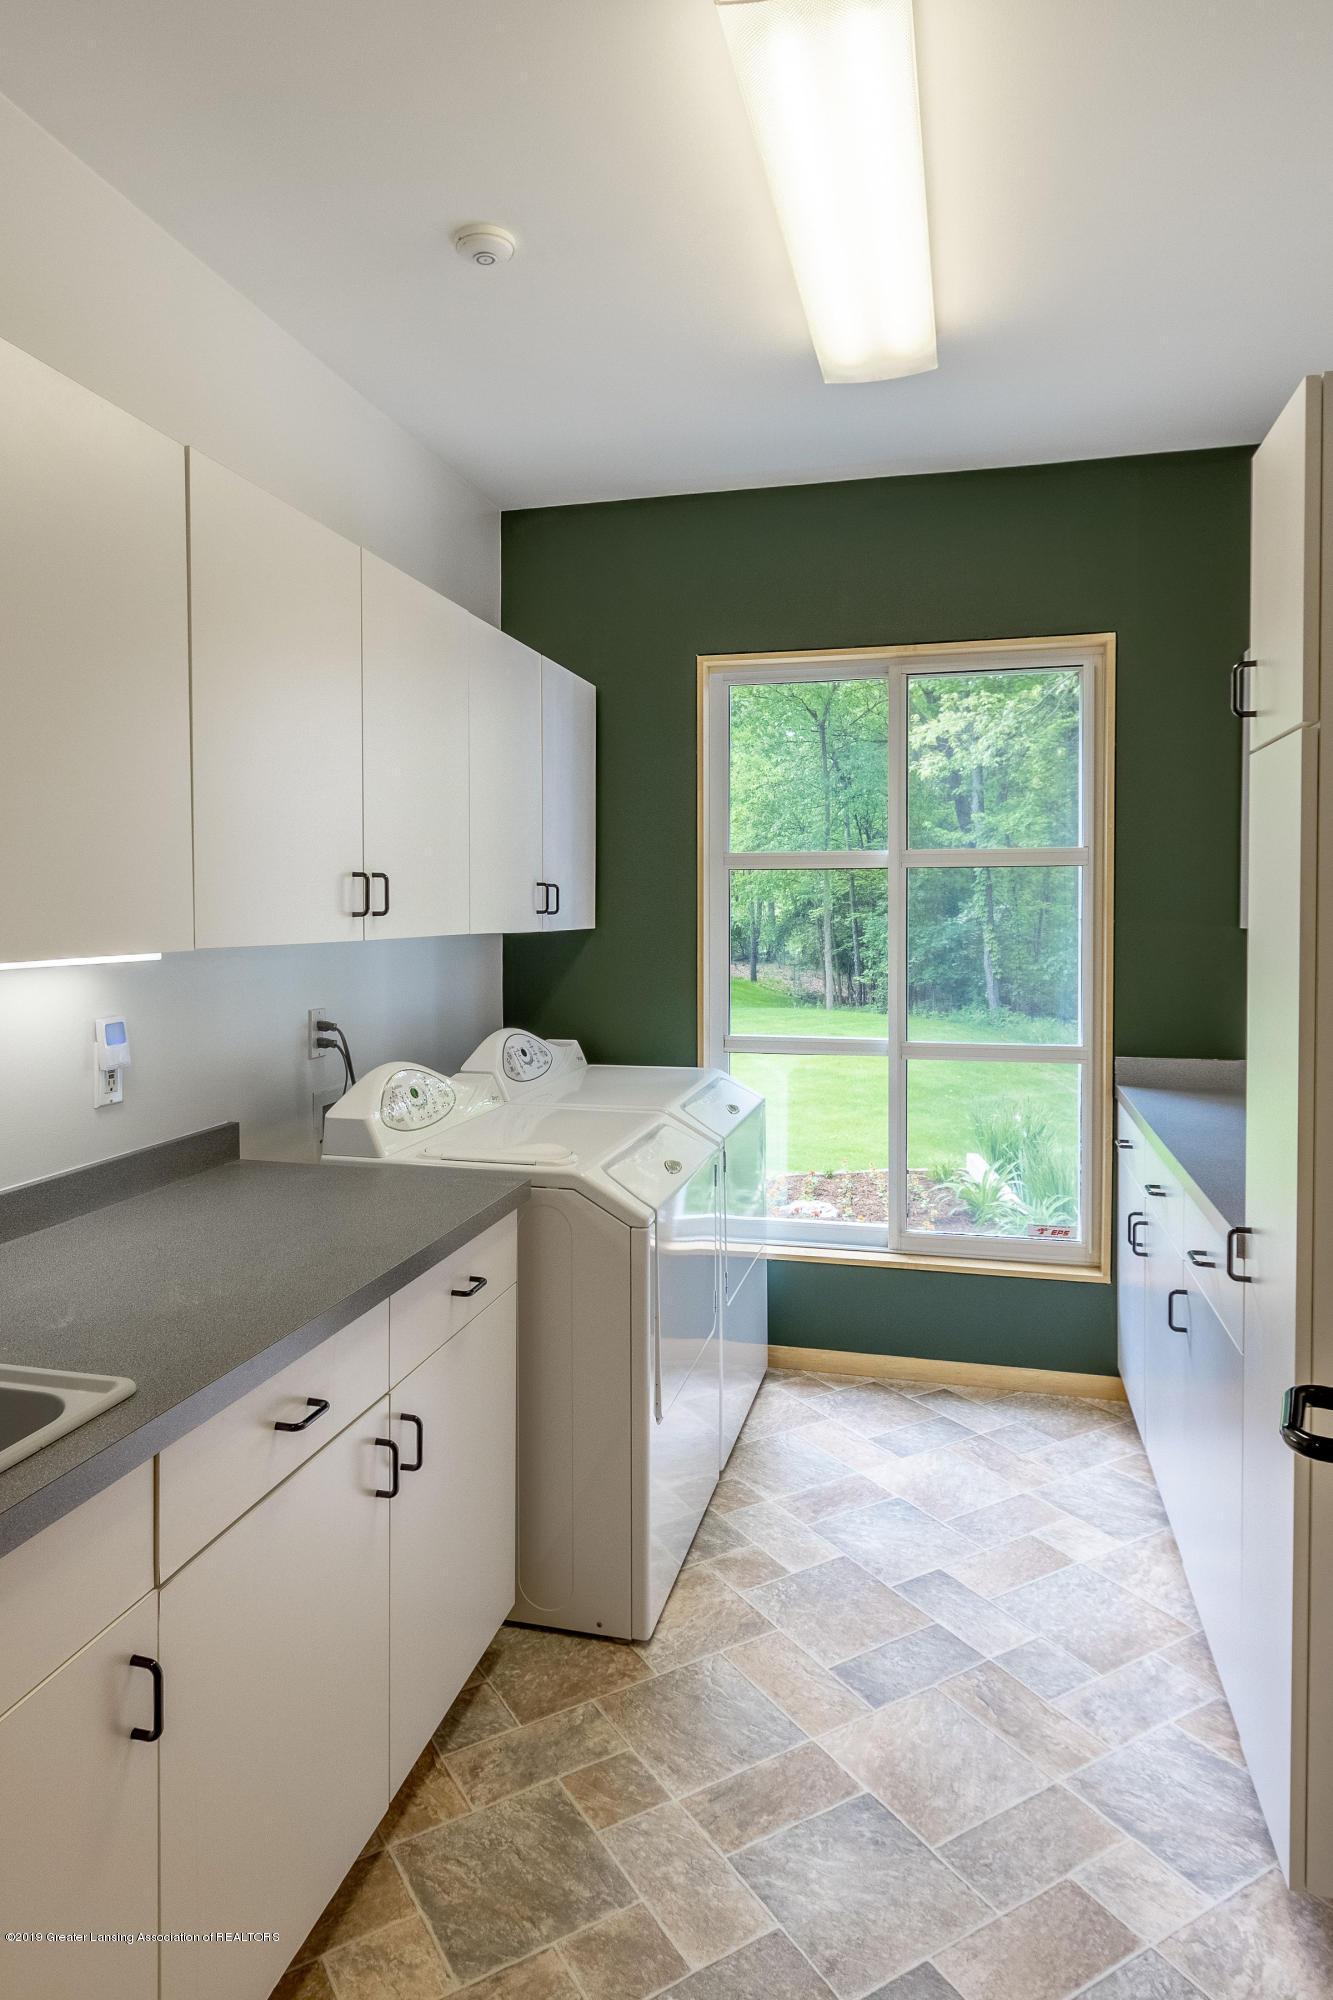 4435 Oak Pointe Ct - Main Floor Laundry Room - 52